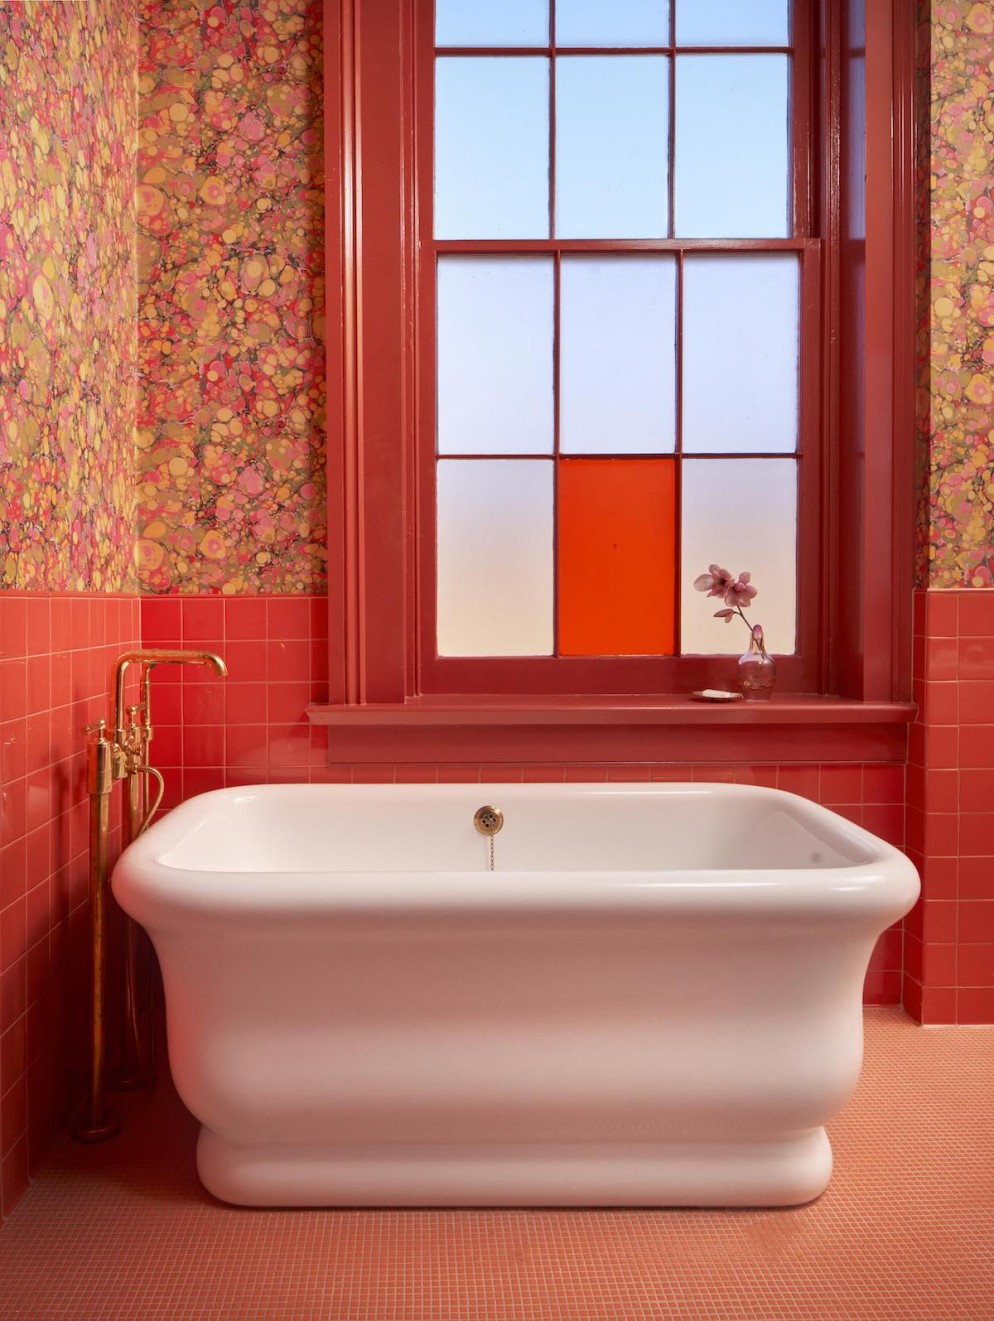 Hotel Saint Vincent - Room x Bathroom 01 - by Nick Simonite